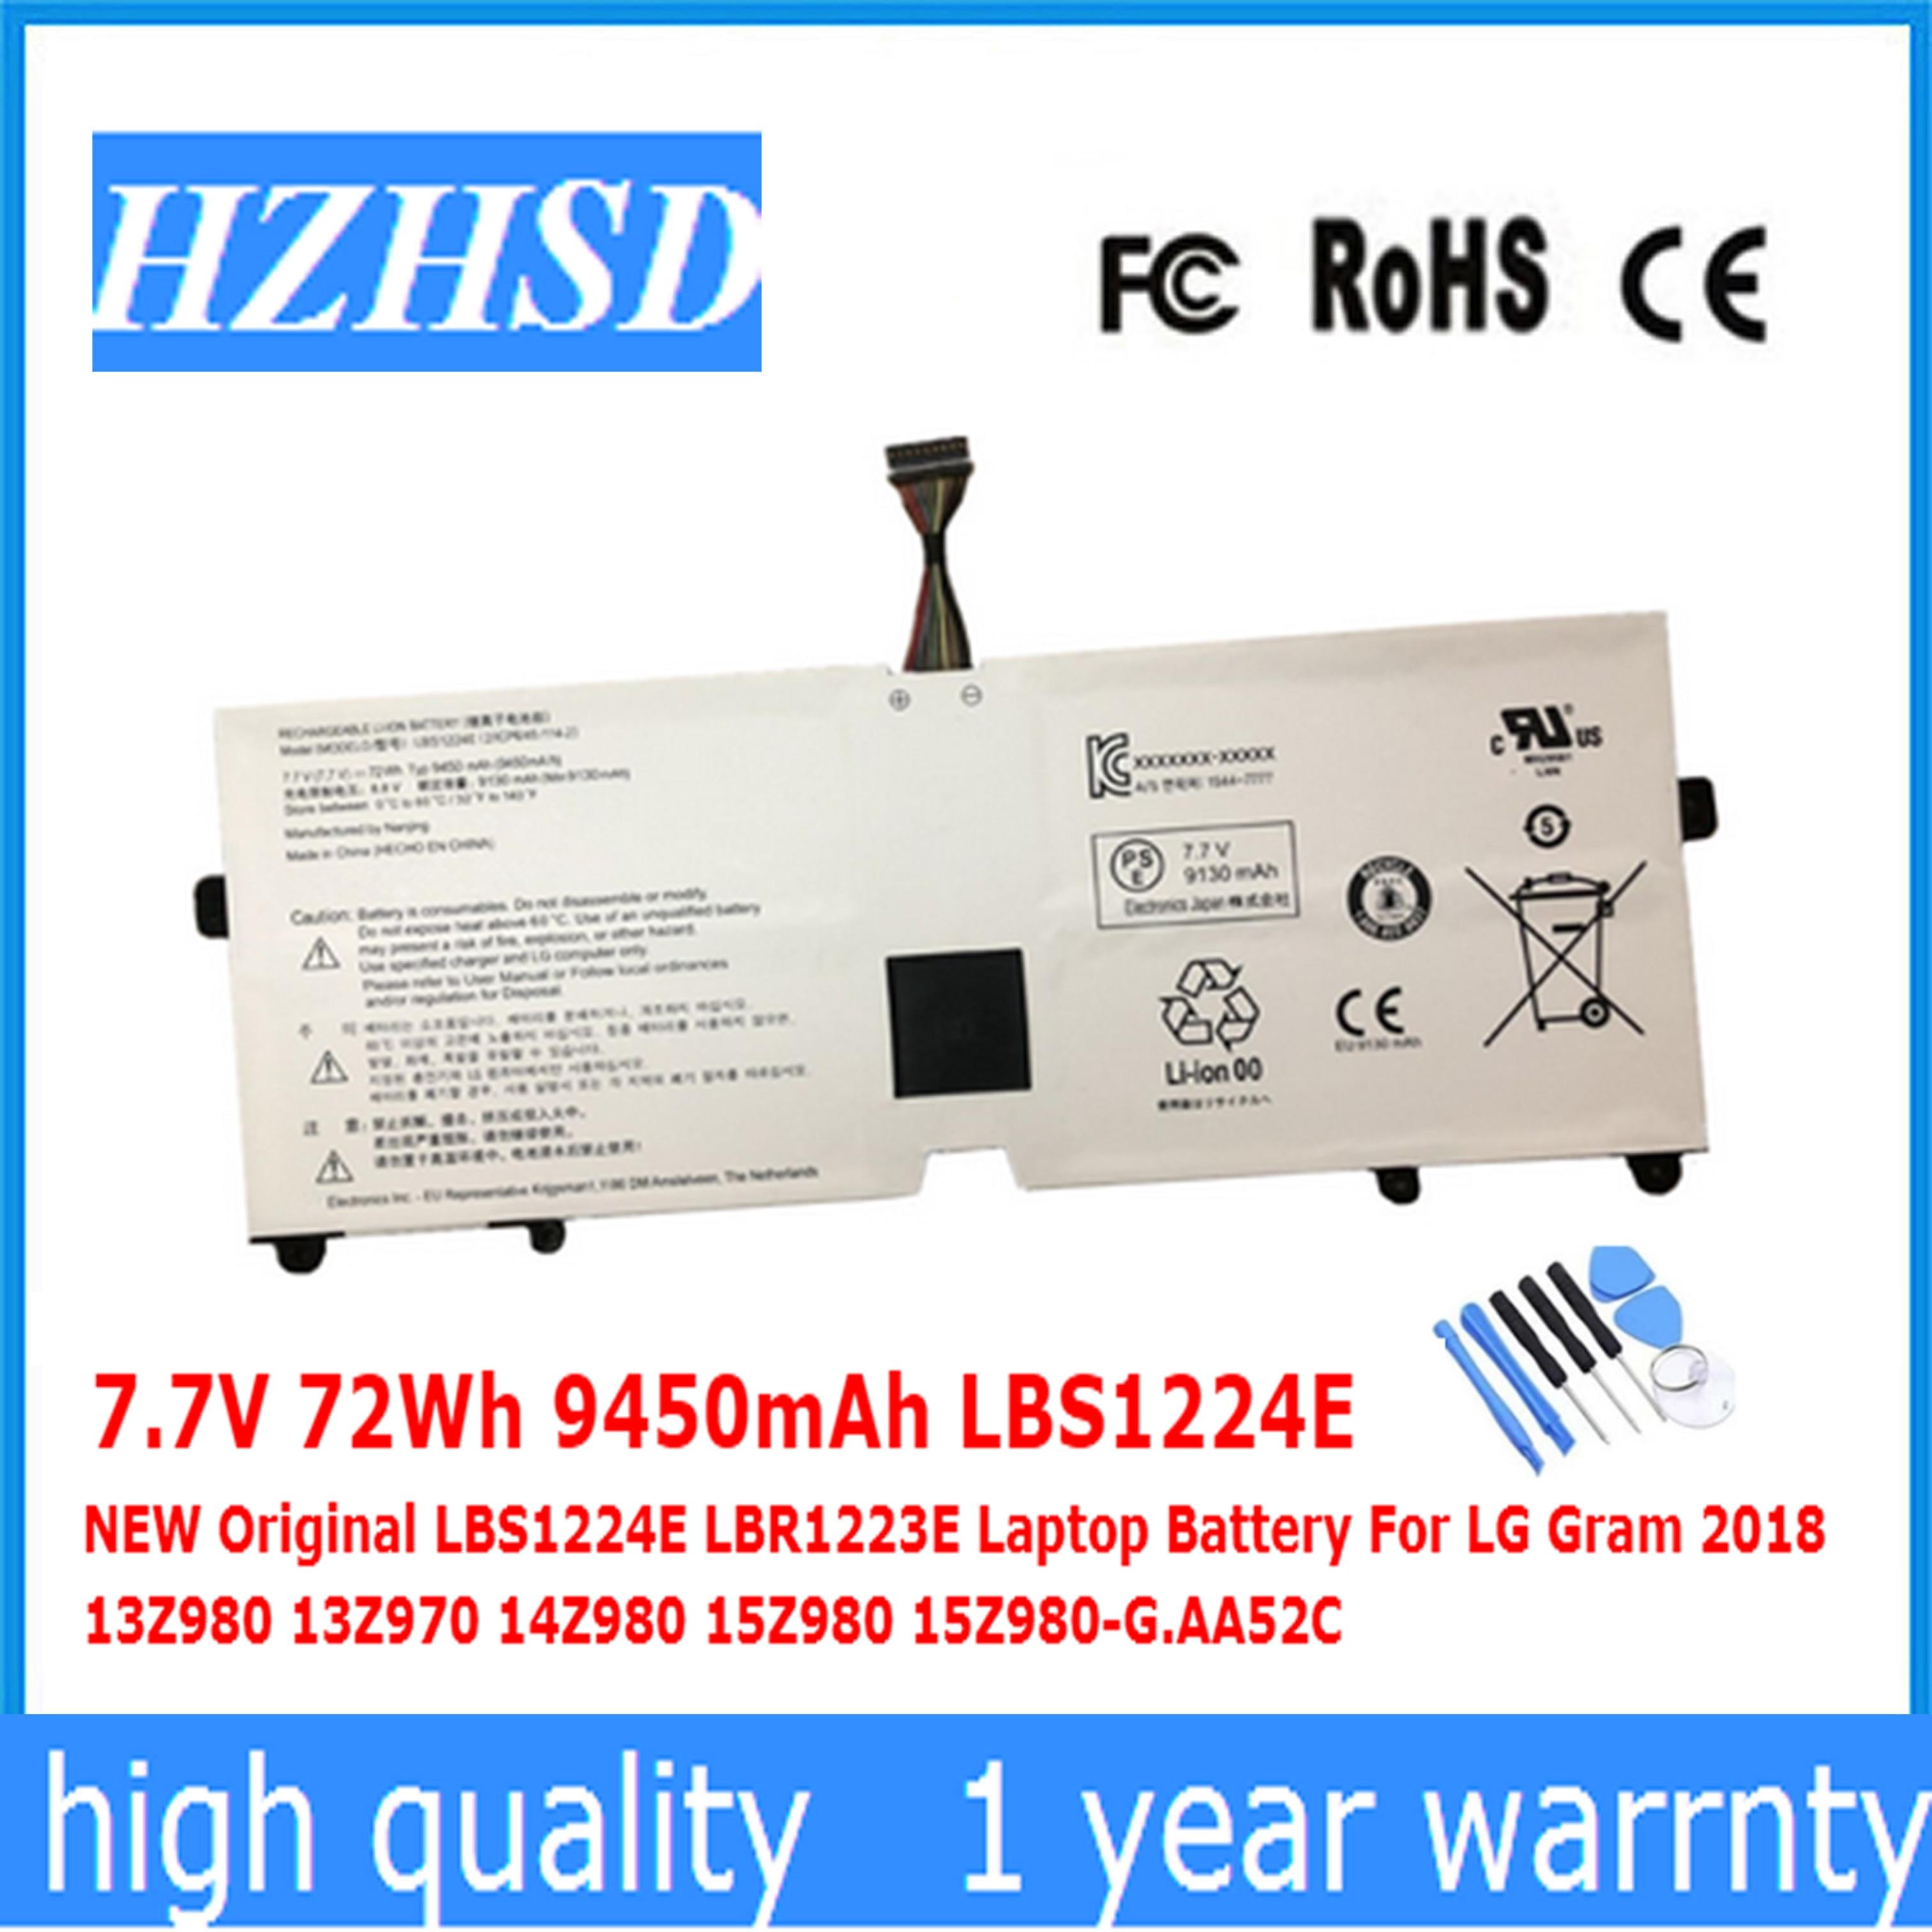 7.7V 72Wh 9450mAh LBS1224E NEW Original LBR1223E Laptop Battery For LG Gram 2018 13Z980 13Z970 14Z980 15Z980 15Z980-G AA52C